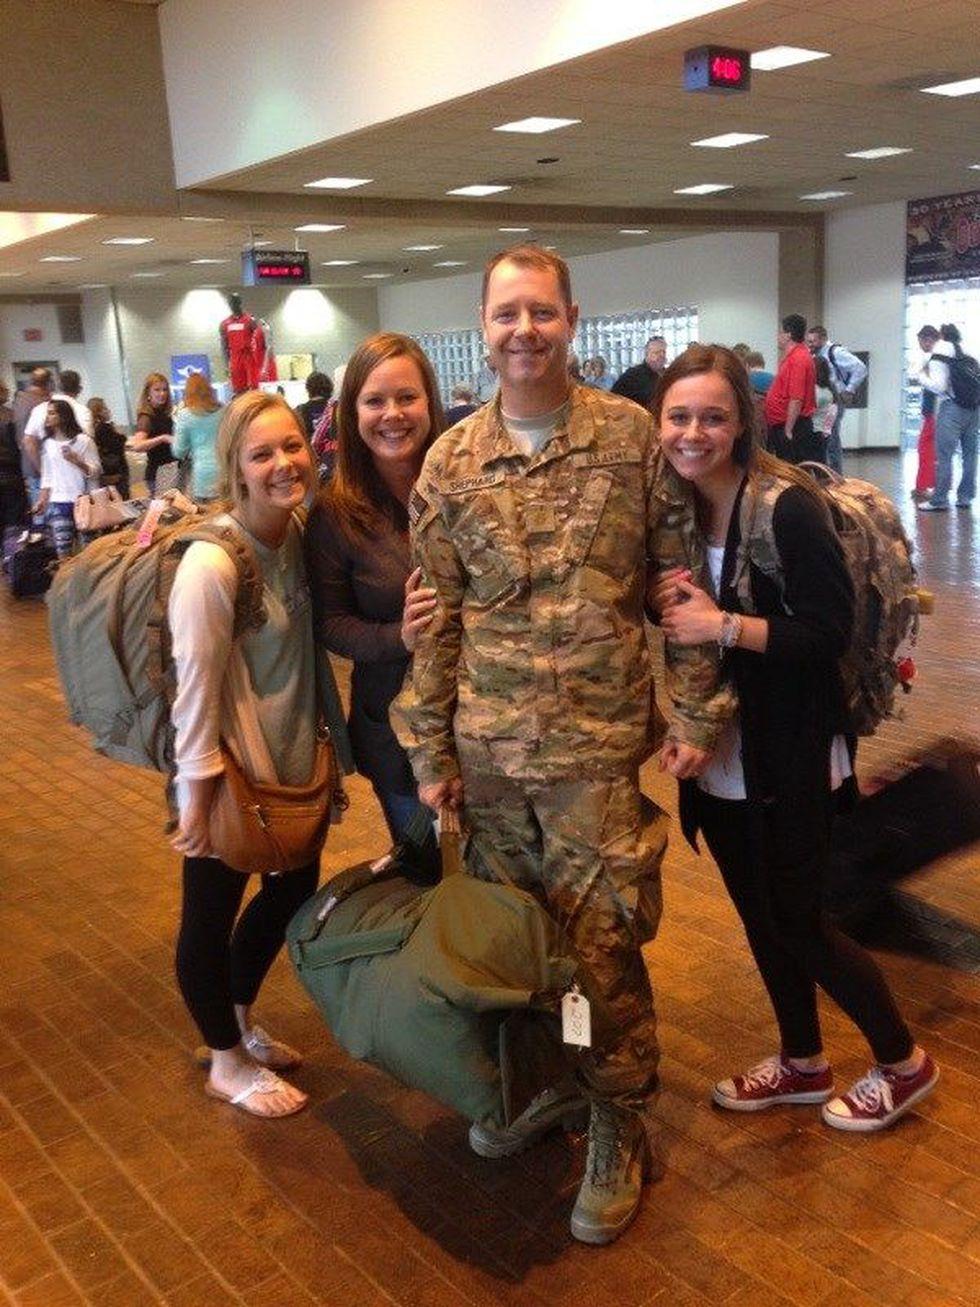 Dr. Shephard, Melanie & their daughters